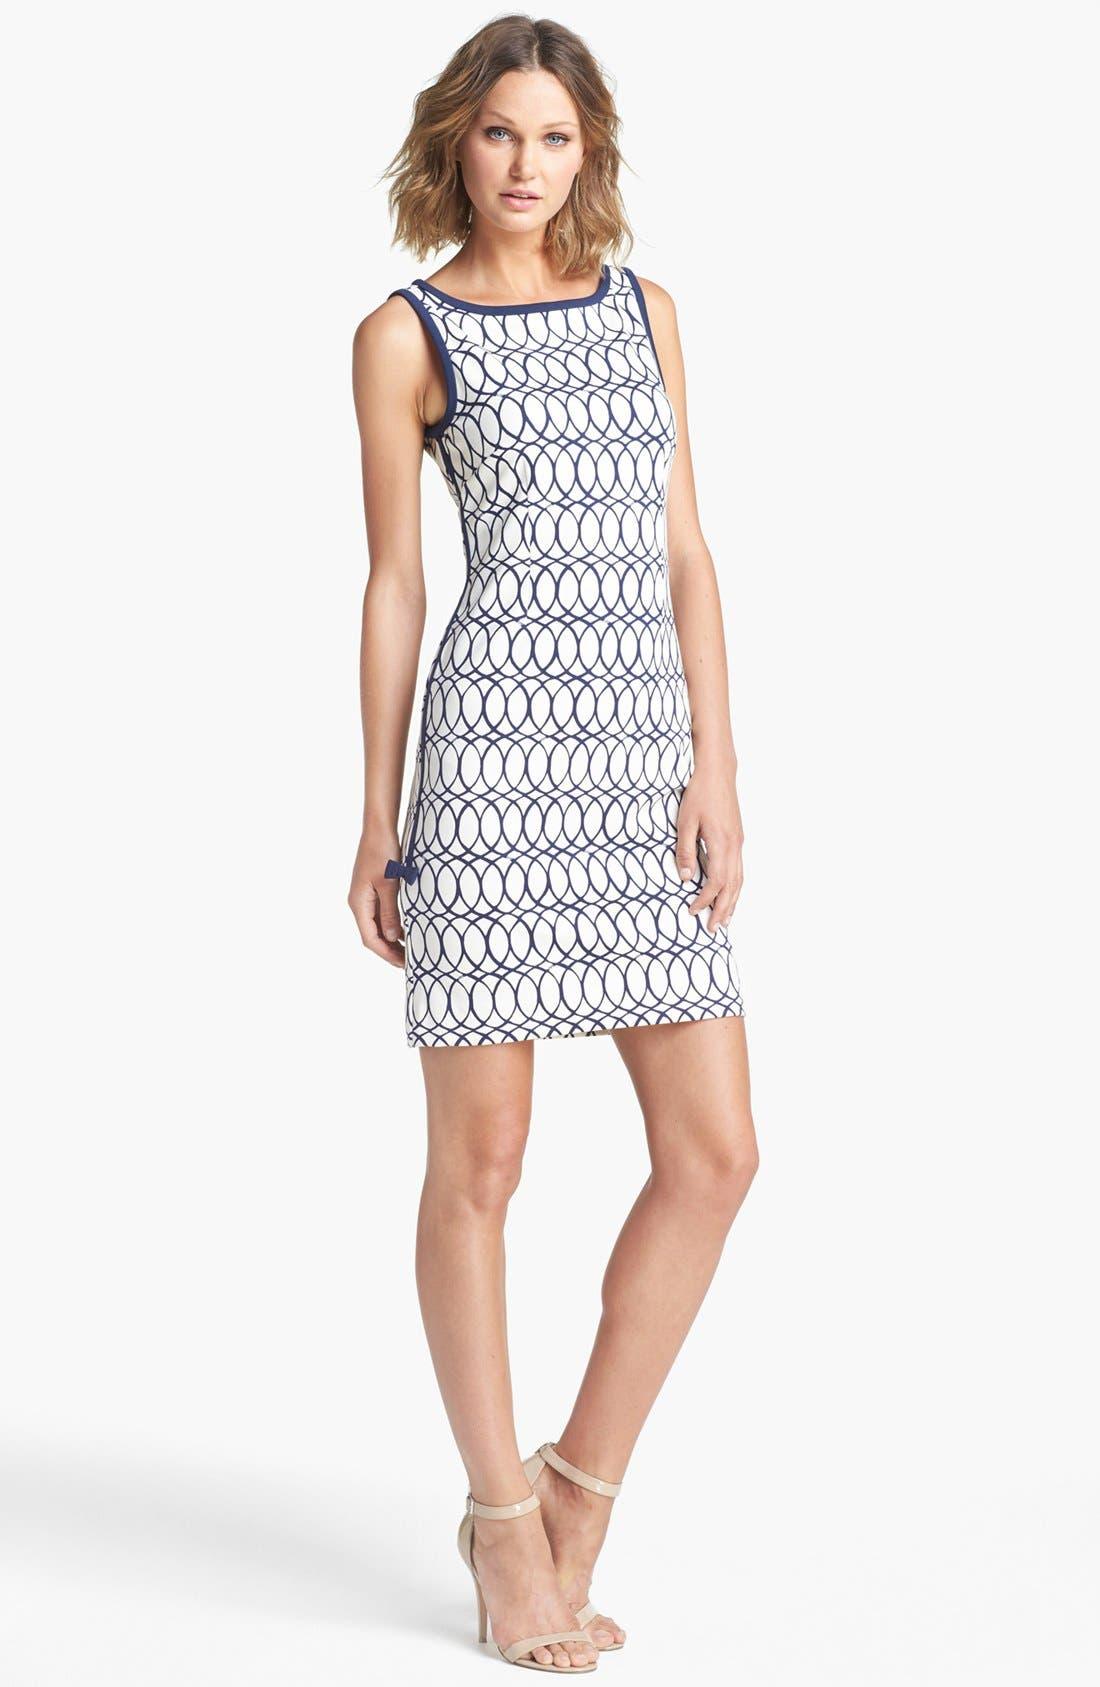 Alternate Image 1 Selected - Lilly Pulitzer® 'Francesca' Print Sheath Dress